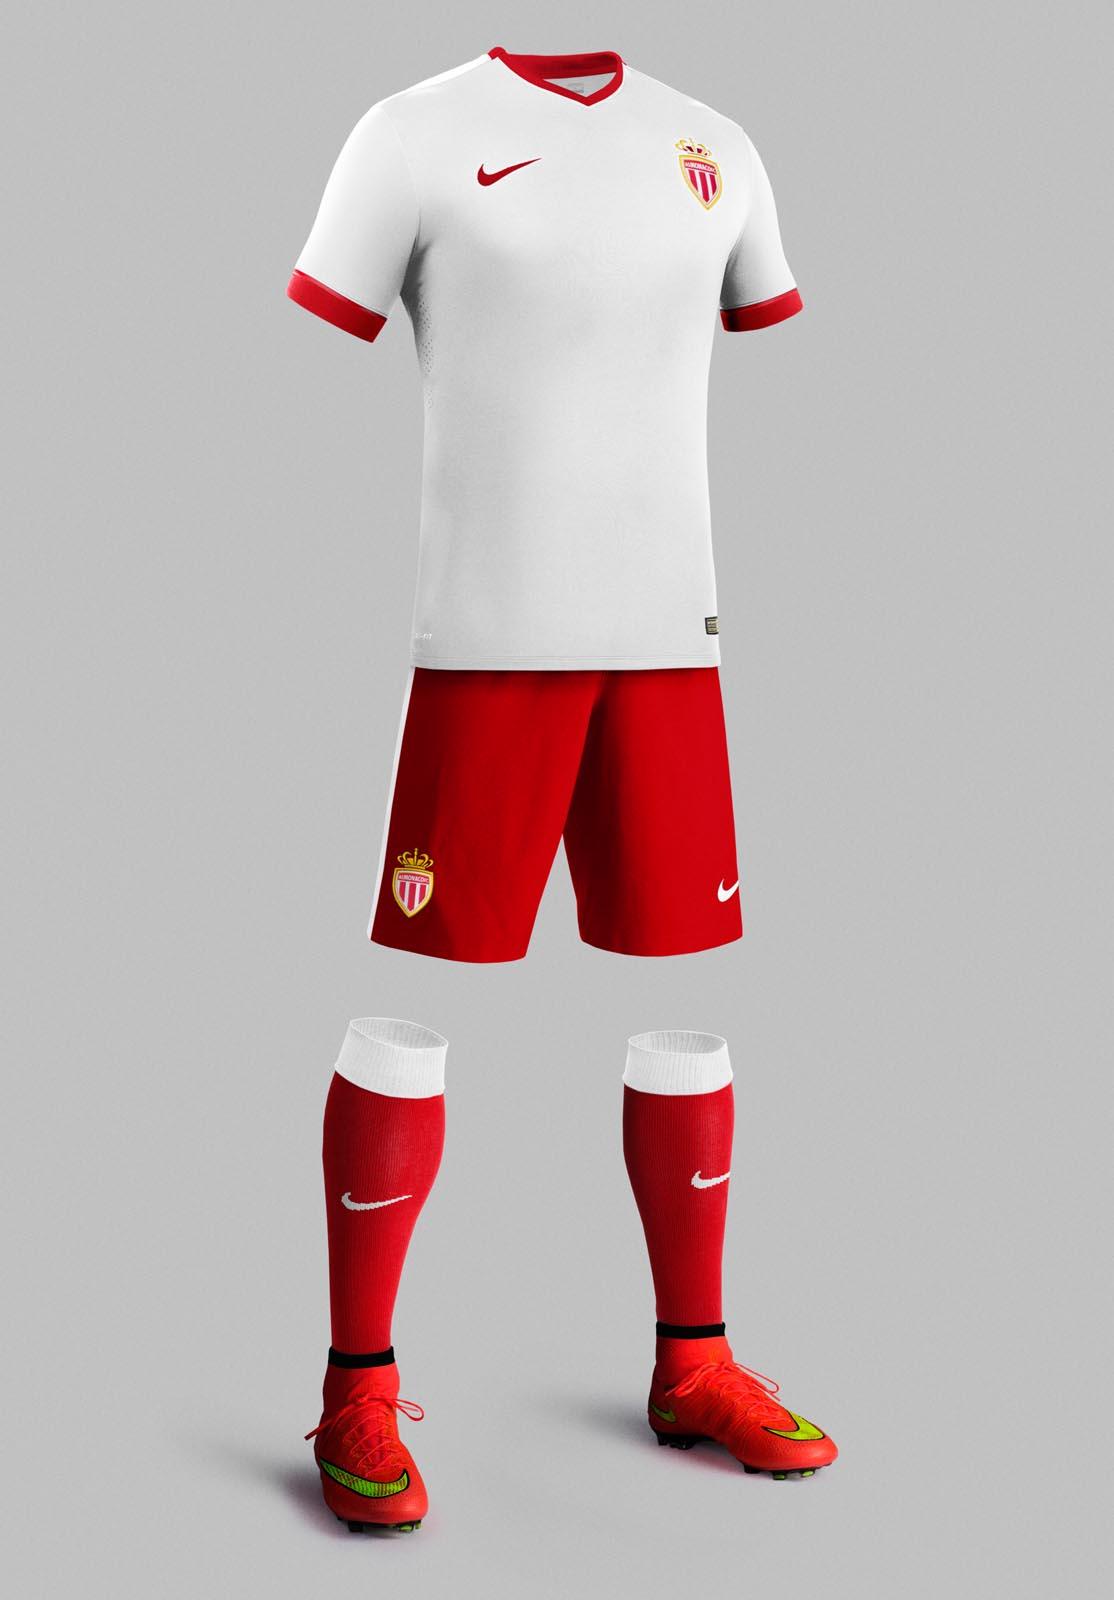 New Nike AS Monaco 14-15 Kits Released